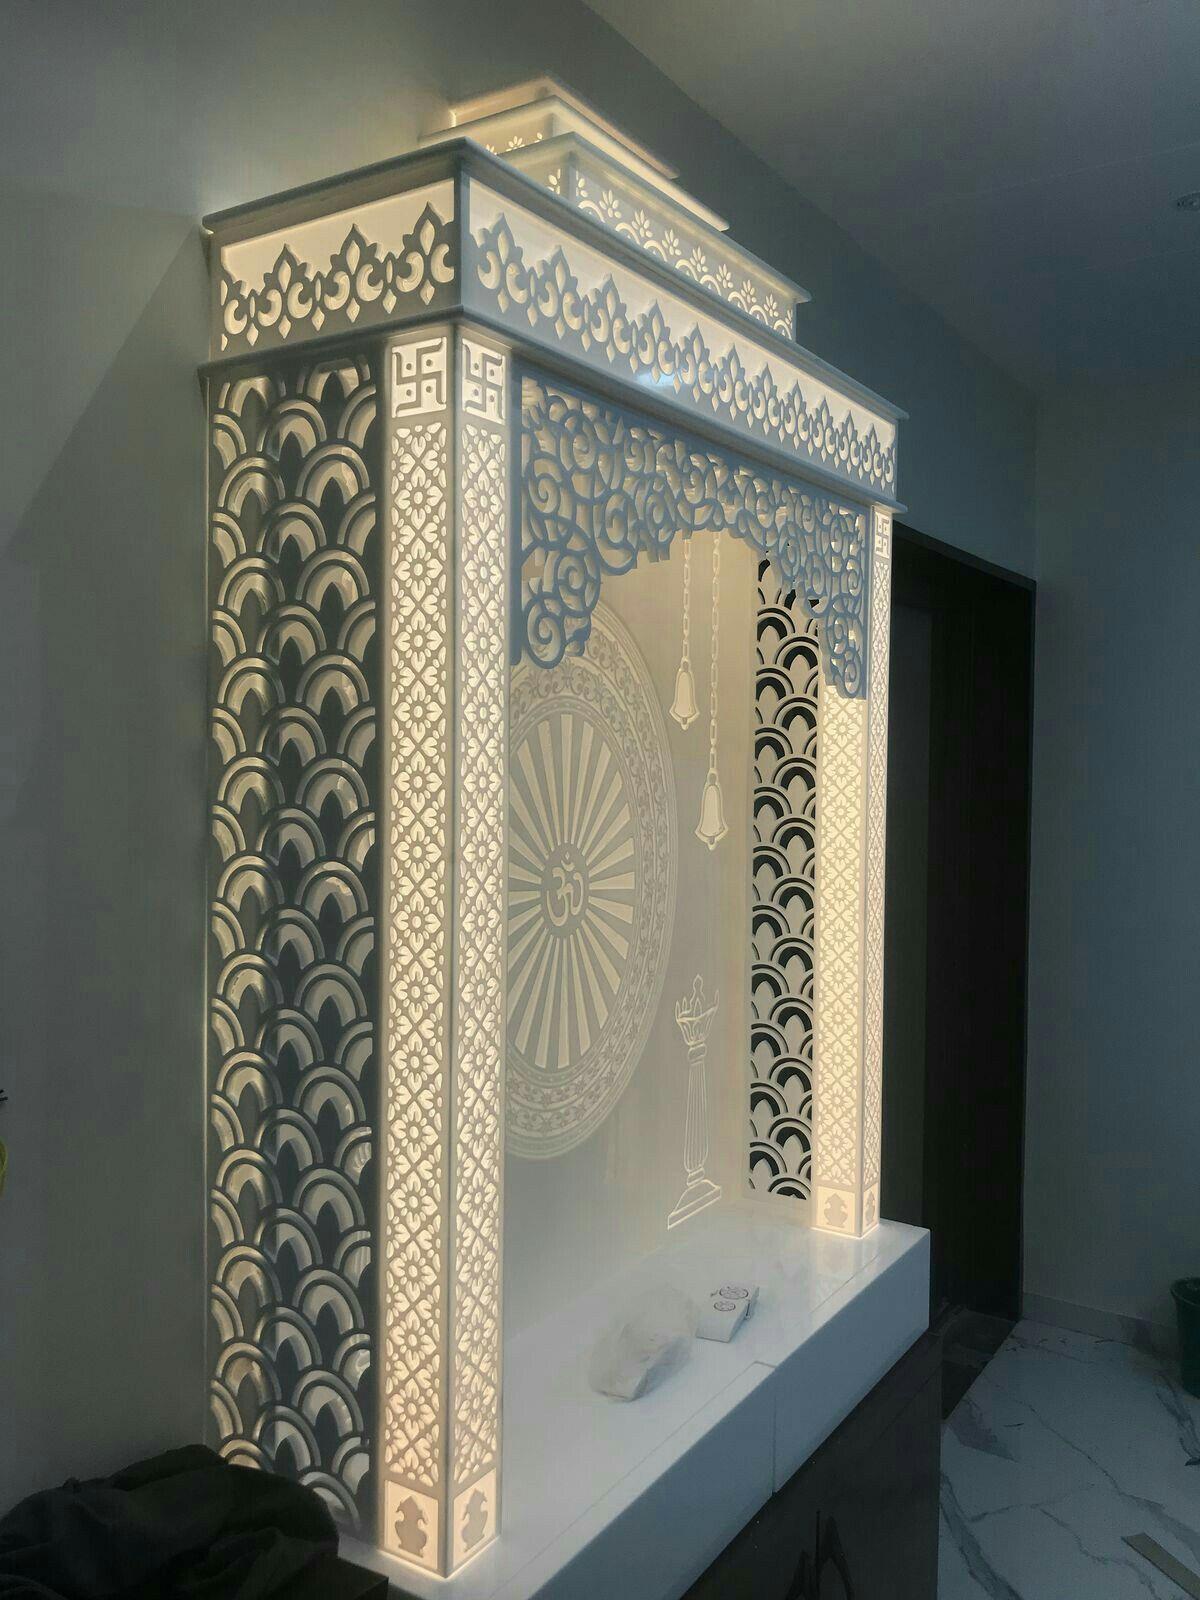 Pooja Room Designs For Flats: Pin By Abhishek Mishra On Cnc Design